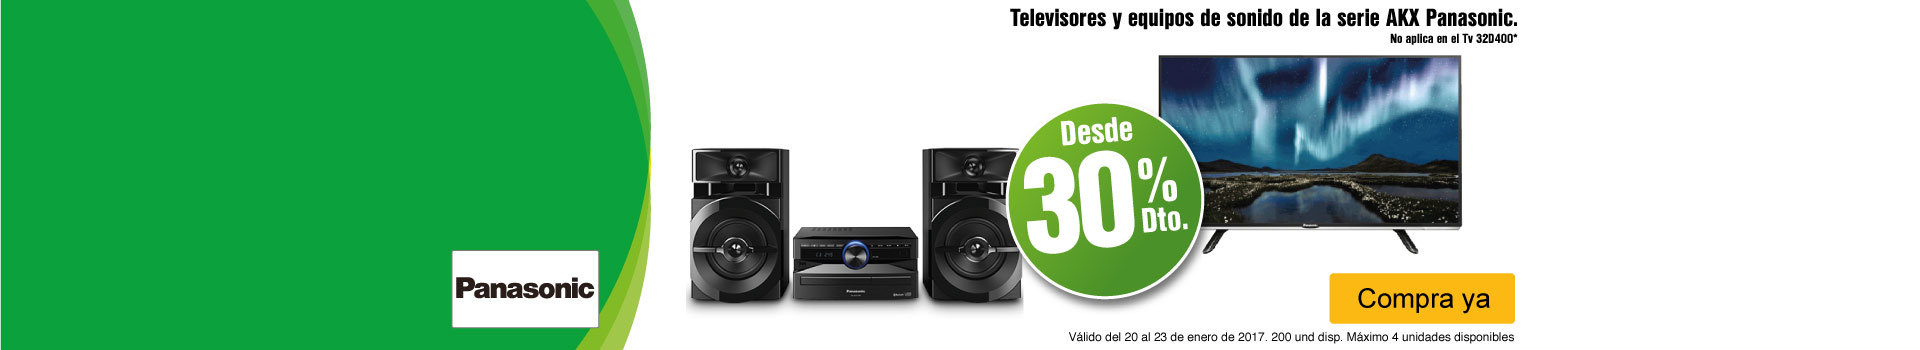 CAT AK-2-TELEVISOR PANASONIC-TV-ENERO20/23